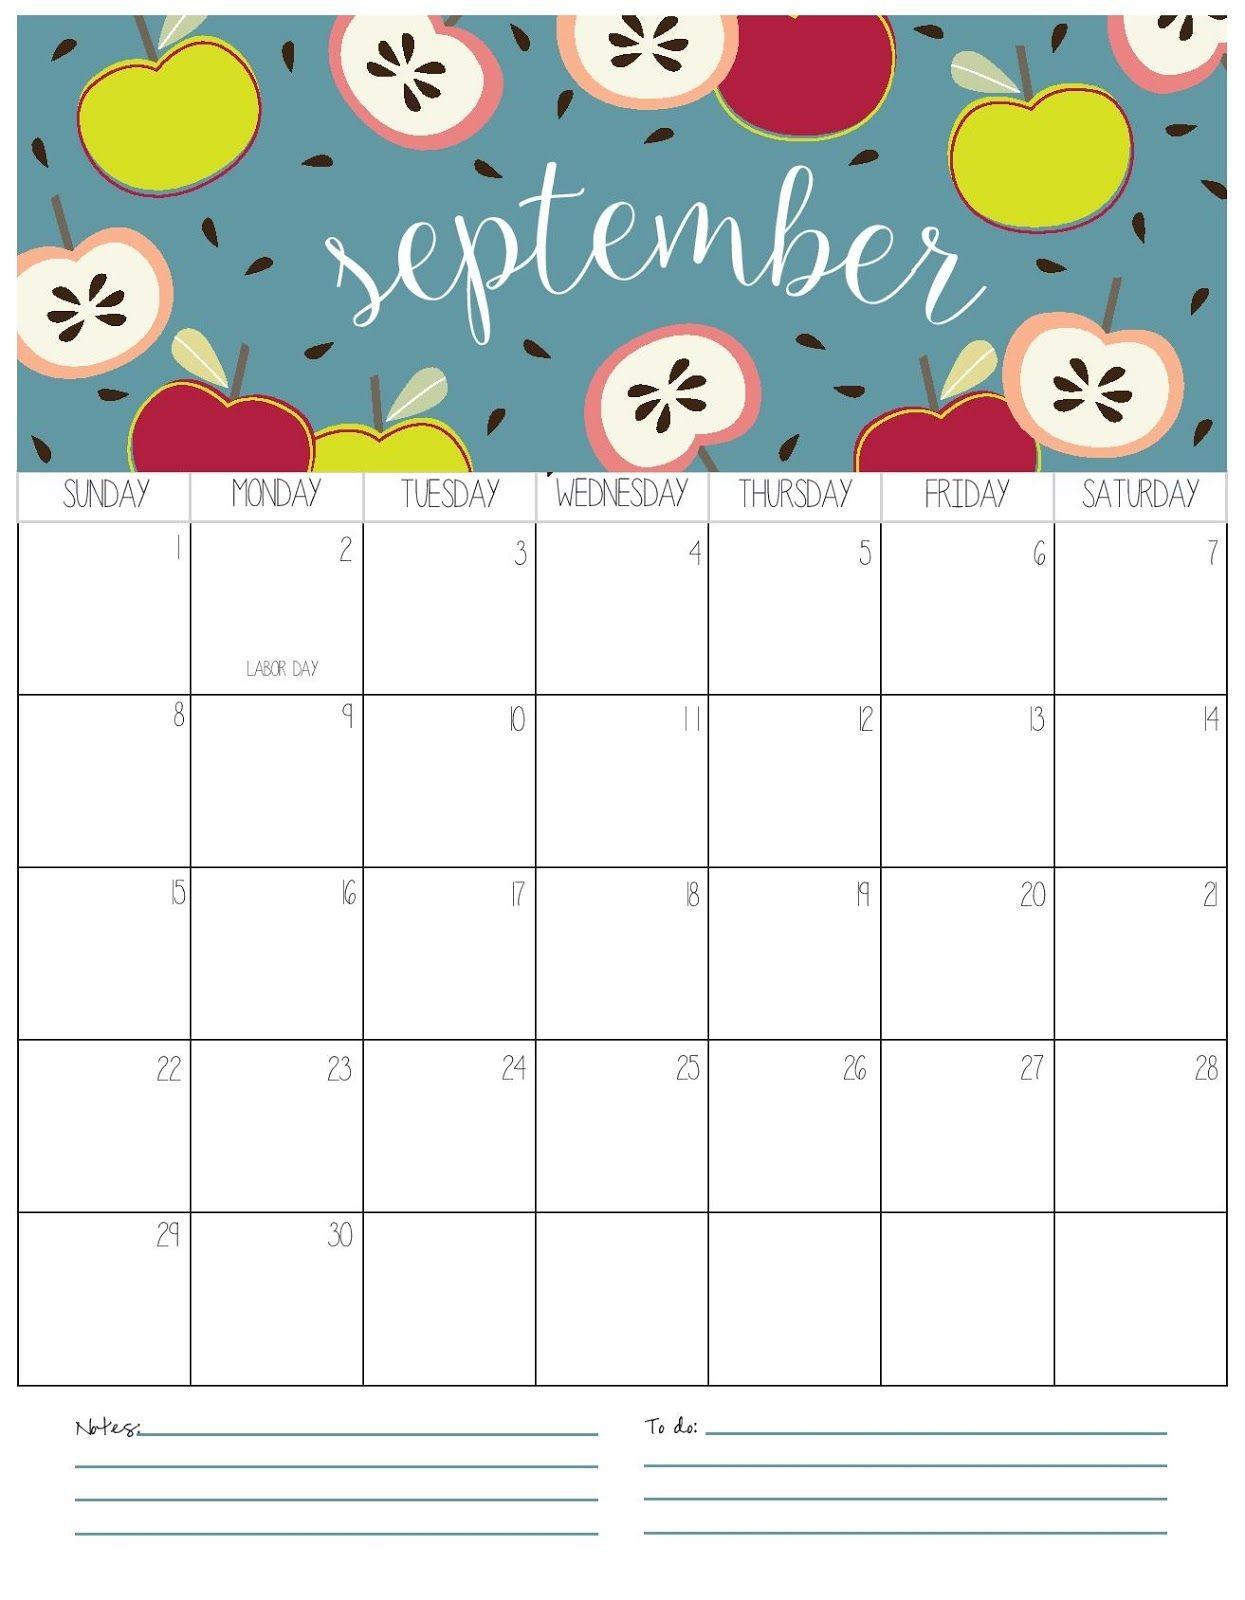 Calendario Anual Imprimir 2019 Más Actual Kalender 2019 Zum Ausdrucken Für Kinder Of Calendario Anual Imprimir 2019 Más Populares Planner 2020 Panda Menino Calendario Kedvencek